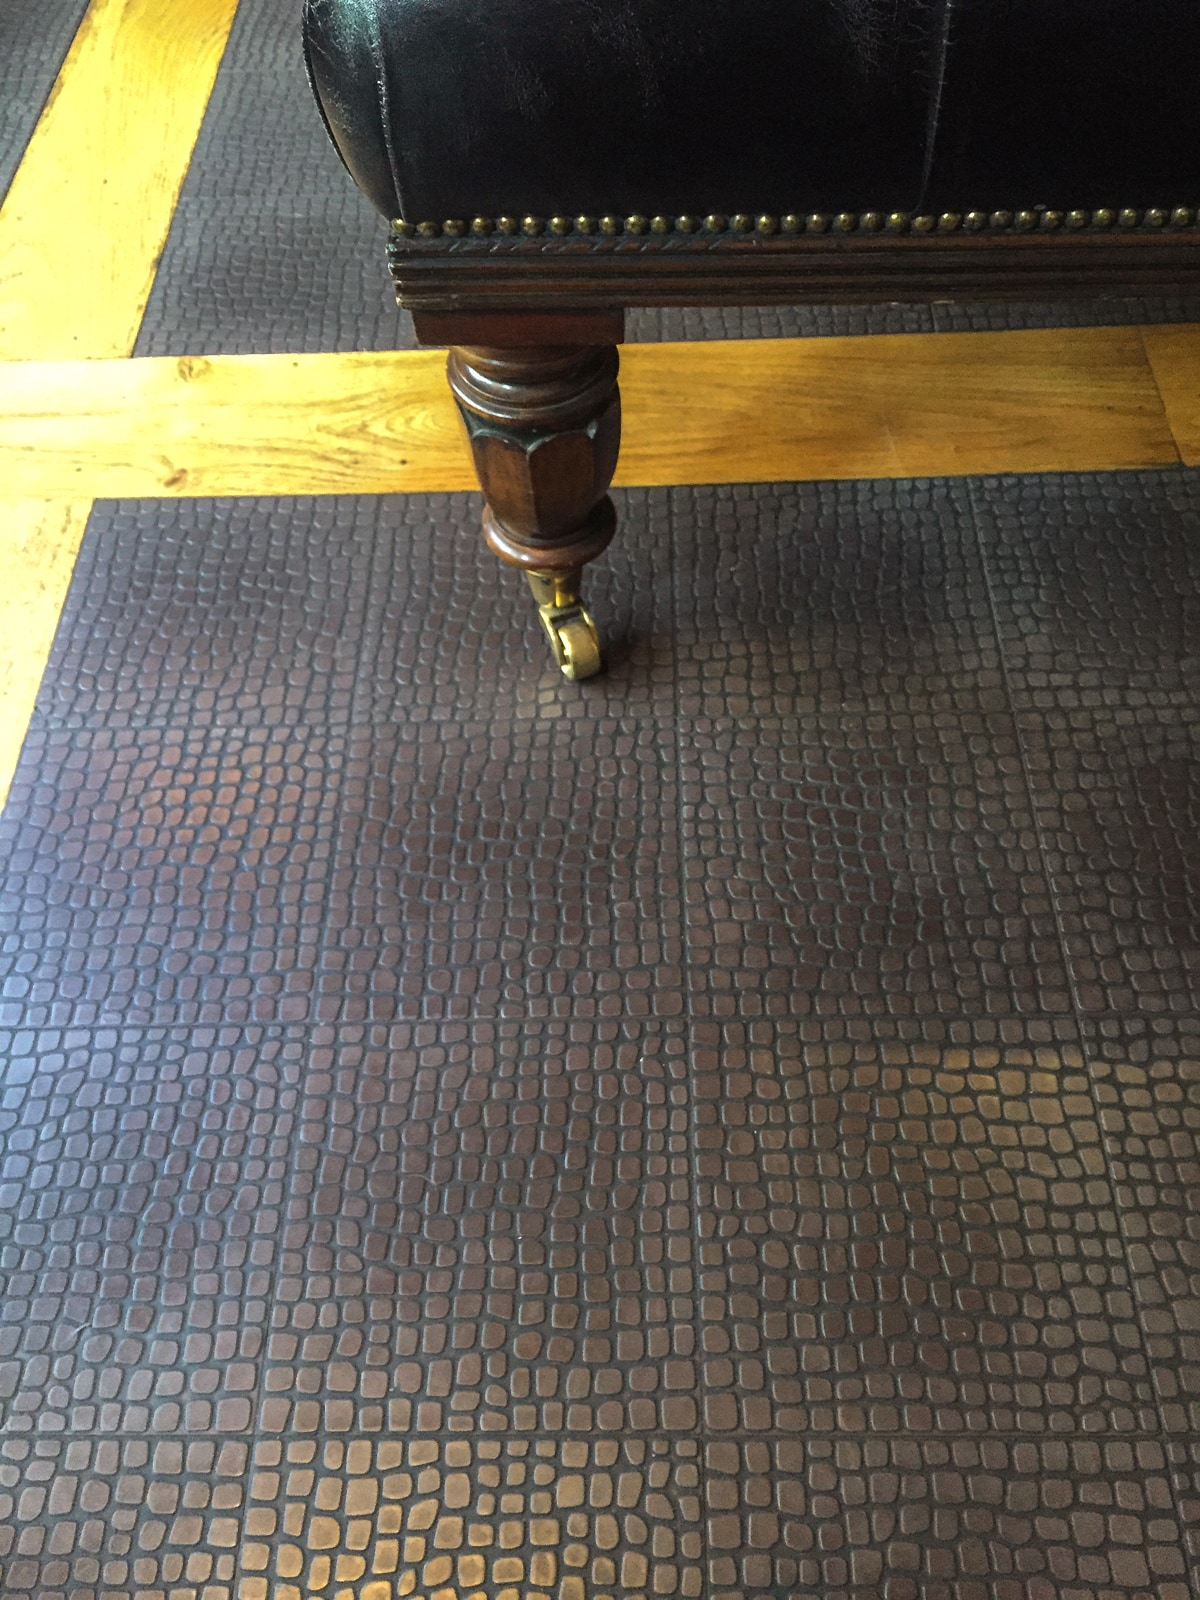 zementfliesen-VIA_zementmosaikplatten-nr.40760-hotel-monbijou-viaplatten | 40760